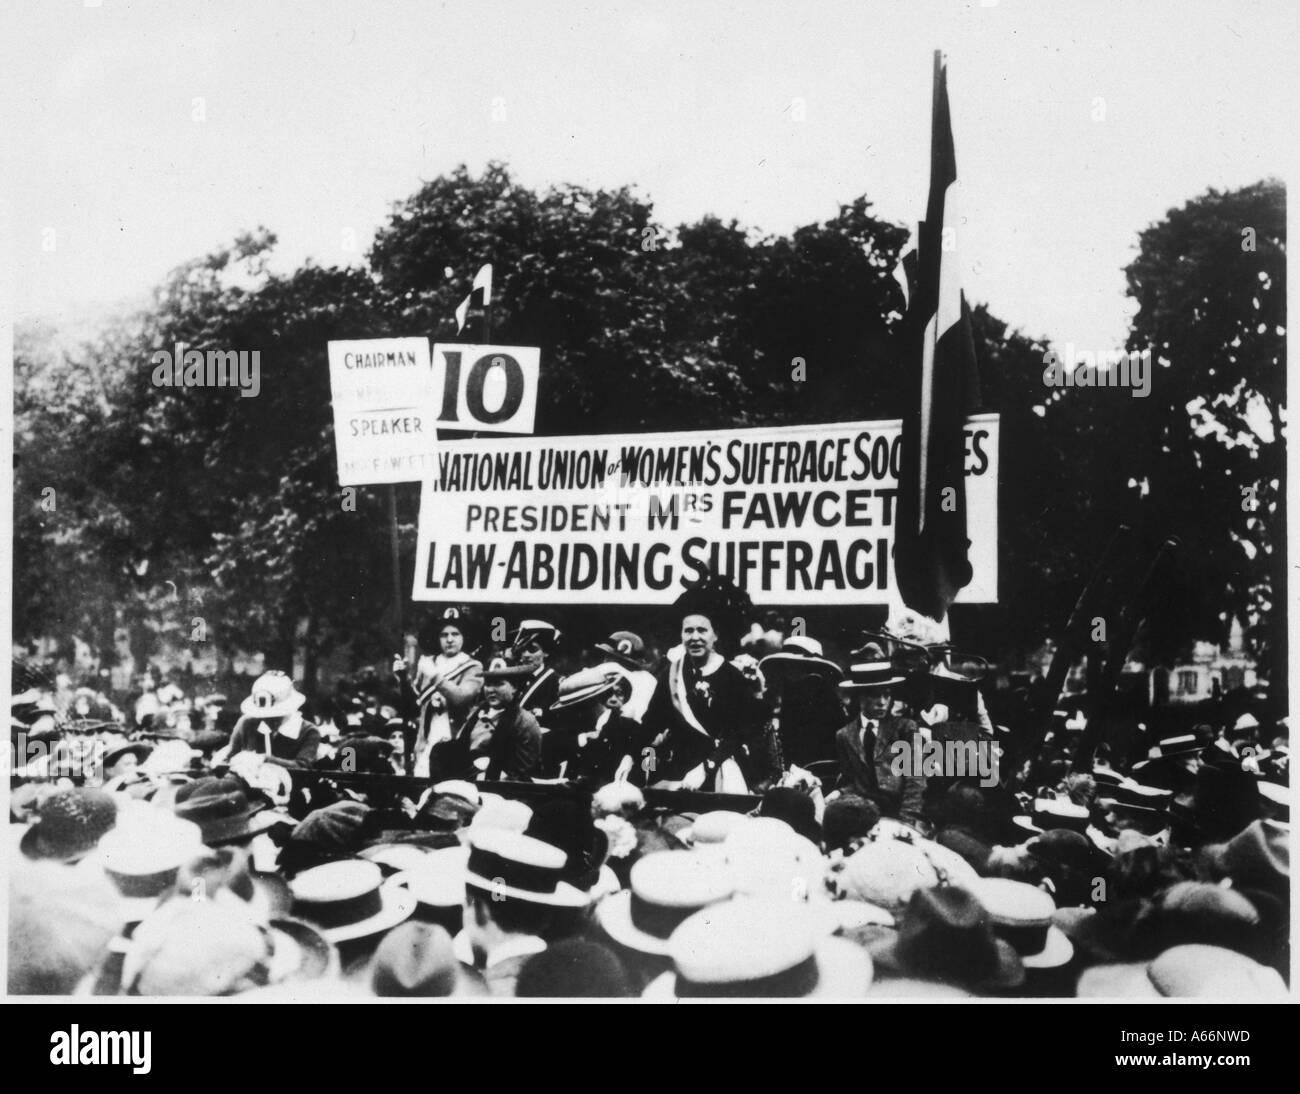 Fawcett Hyde Park 1913 - Stock Image